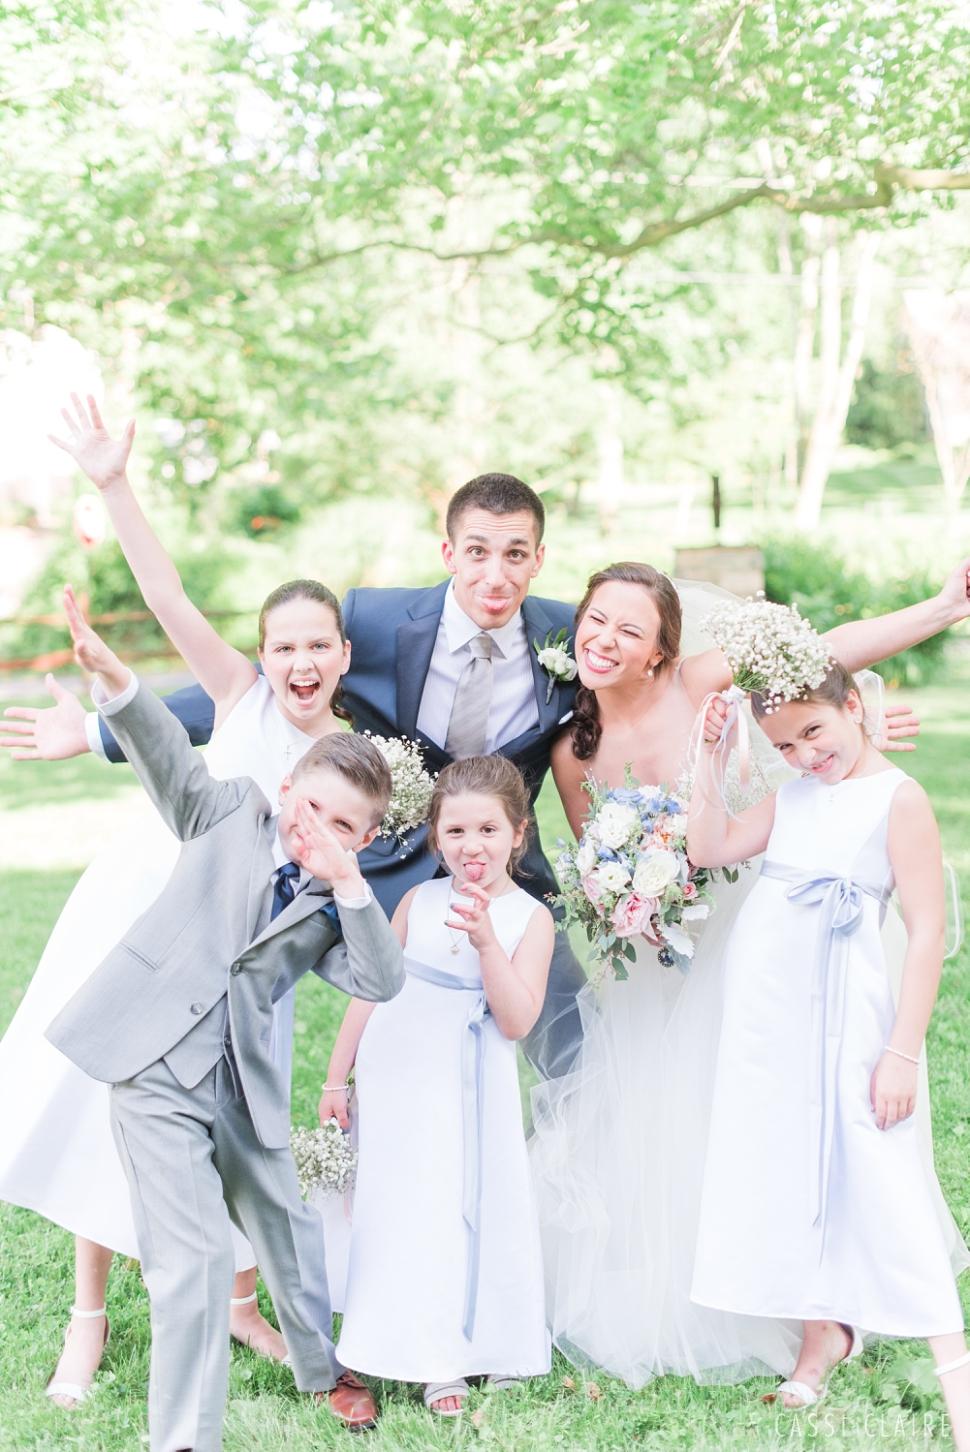 Lake-House-Inn-PA-Wedding_Cassi-Claire_28.jpg